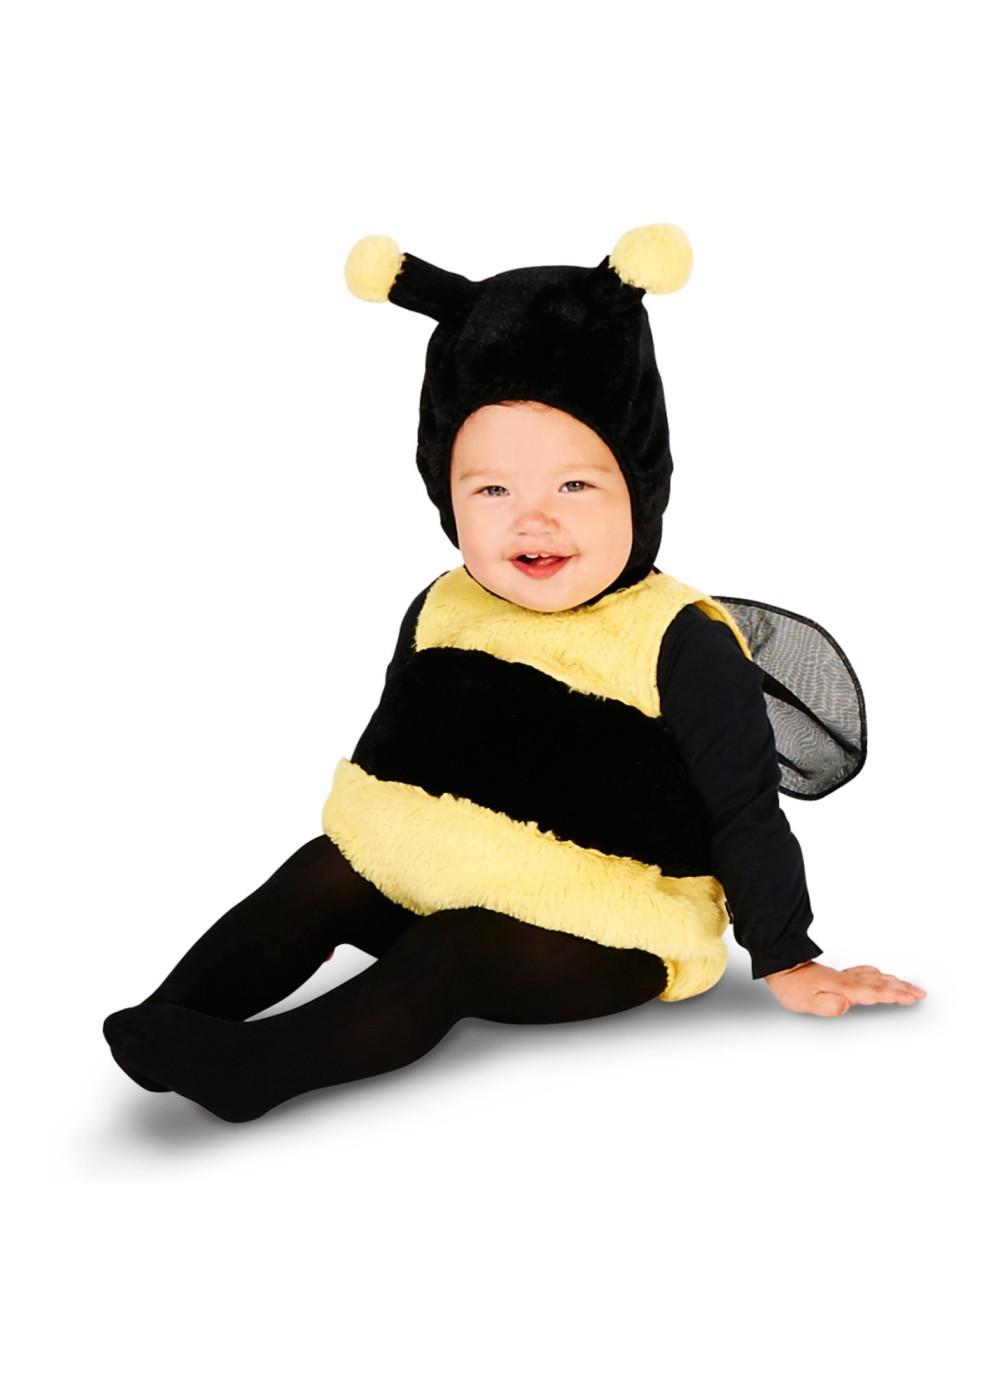 Baby Boys Bumble Bee Costume  sc 1 st  Halloween Costumes & Baby Boys Bumble Bee Costume - Animal Costumes